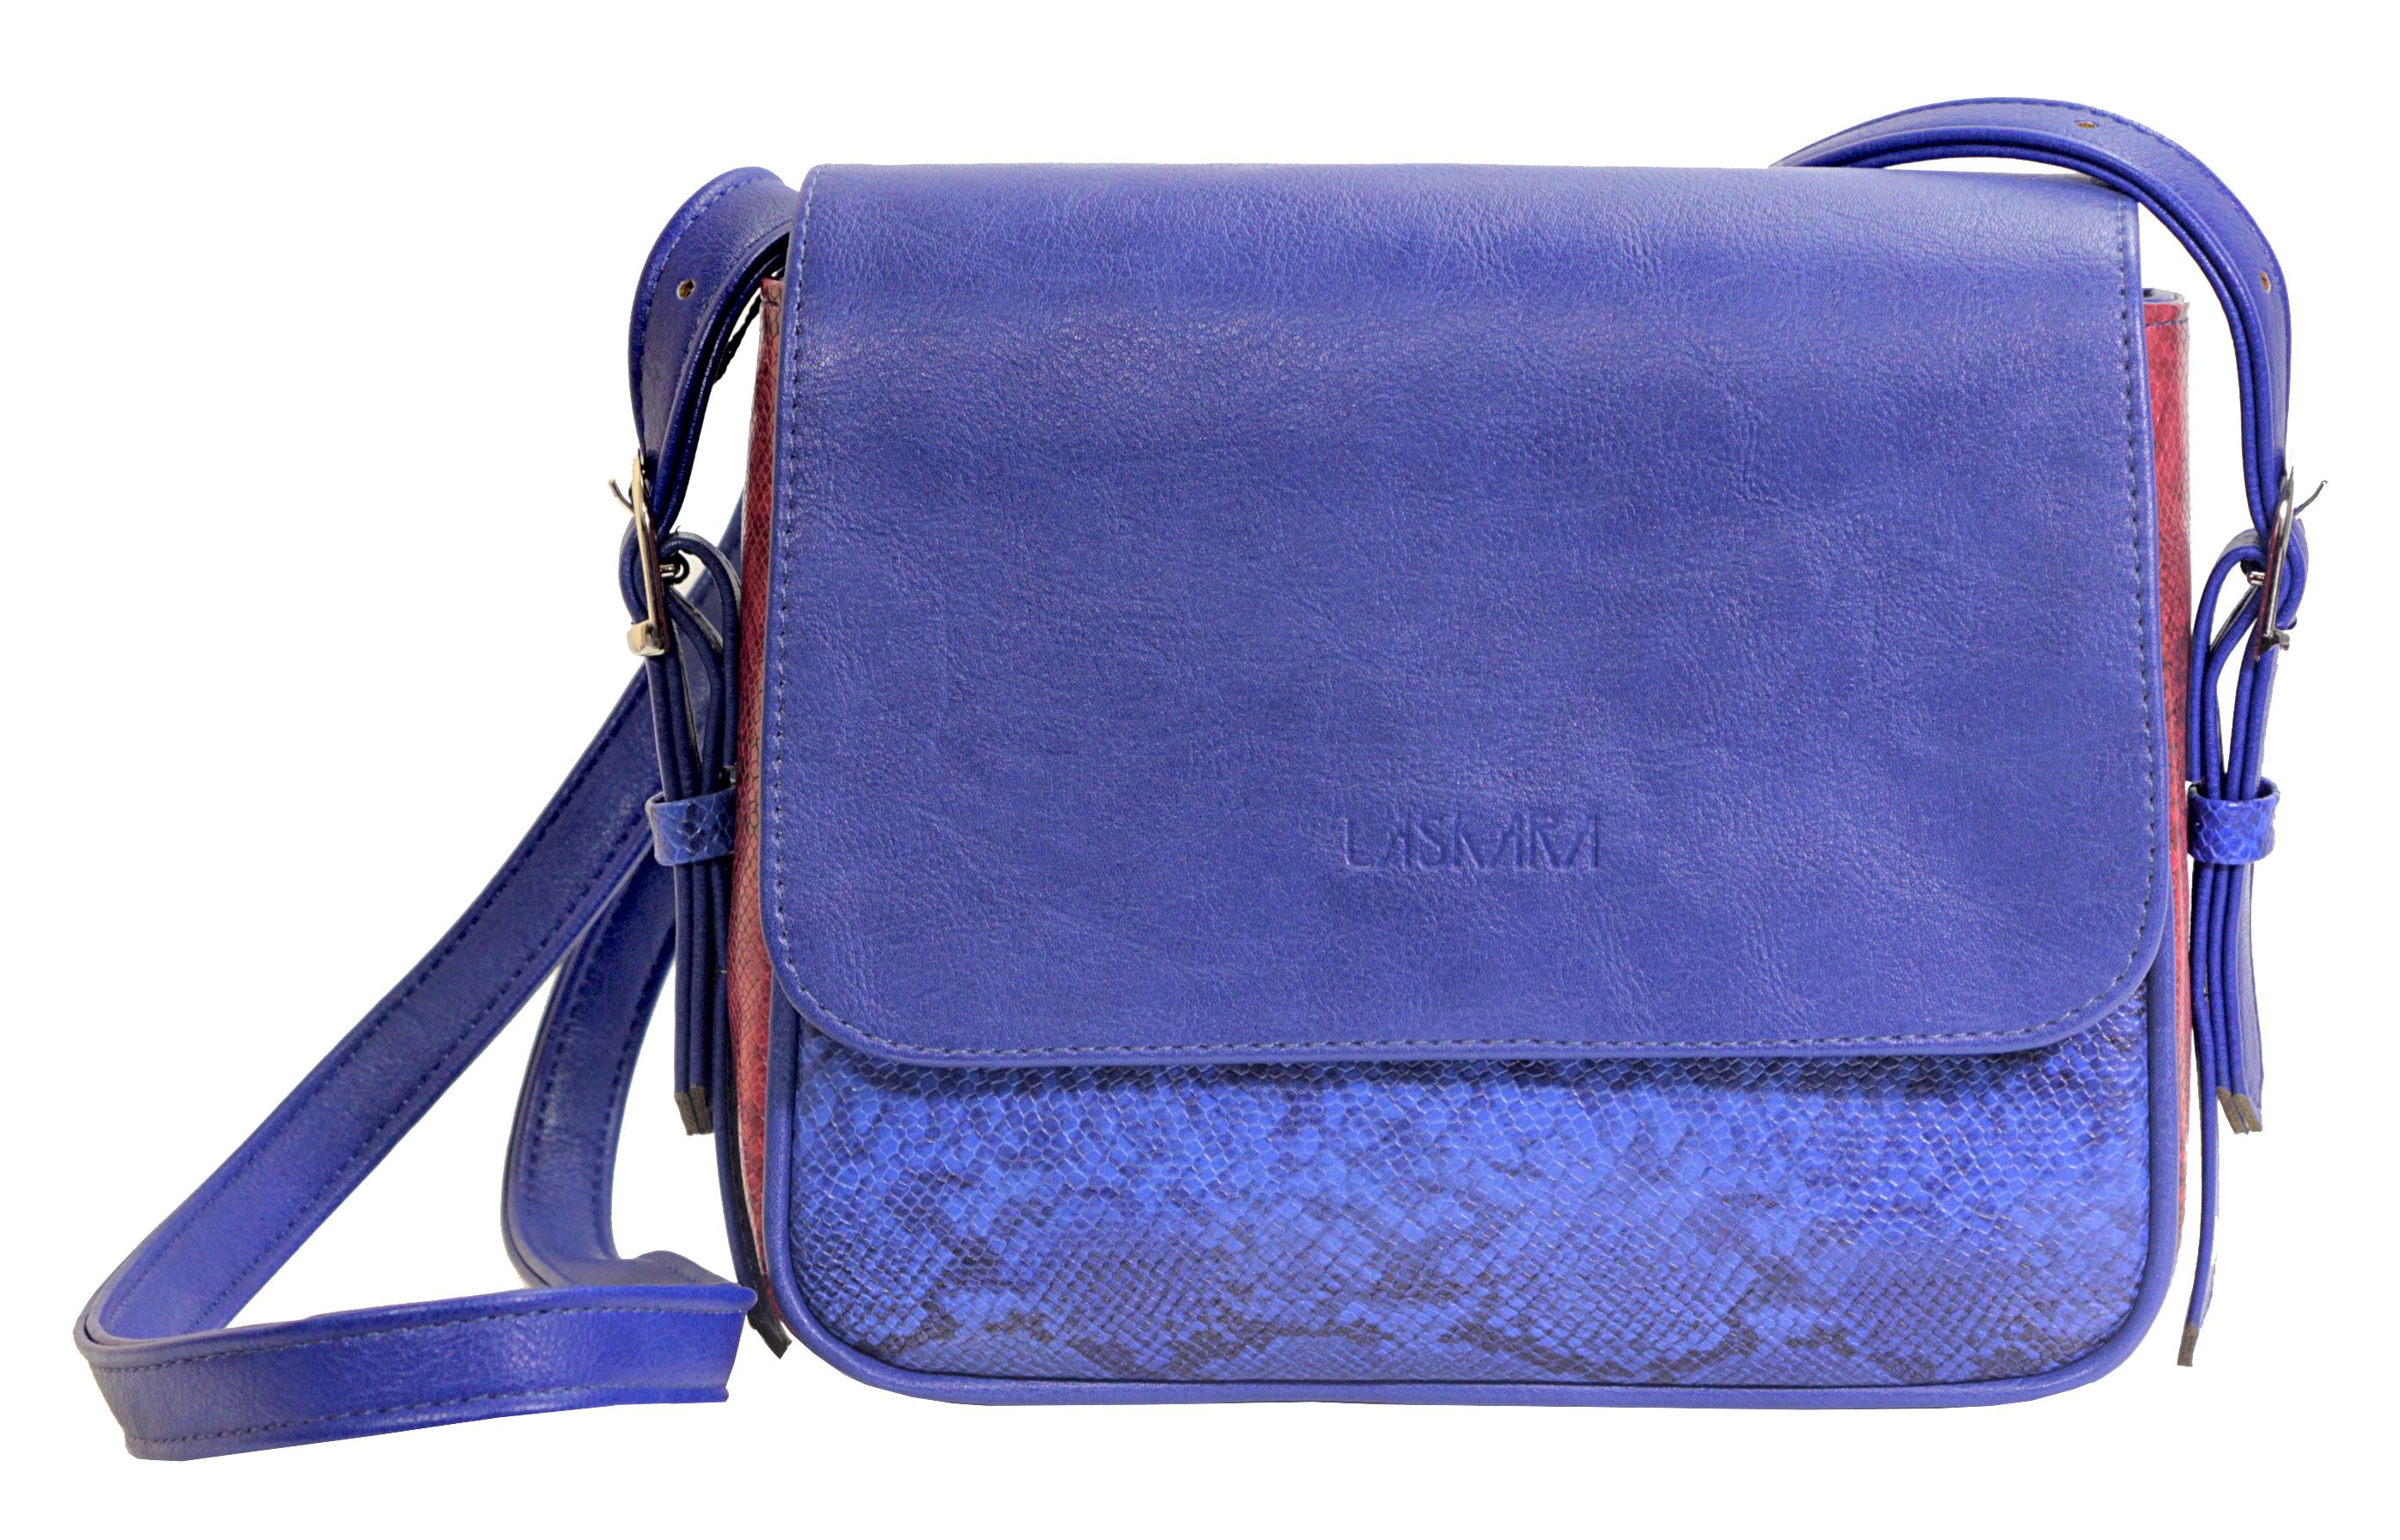 Crossbody kabelka s hadím vzorem 11-10245-blue-snake